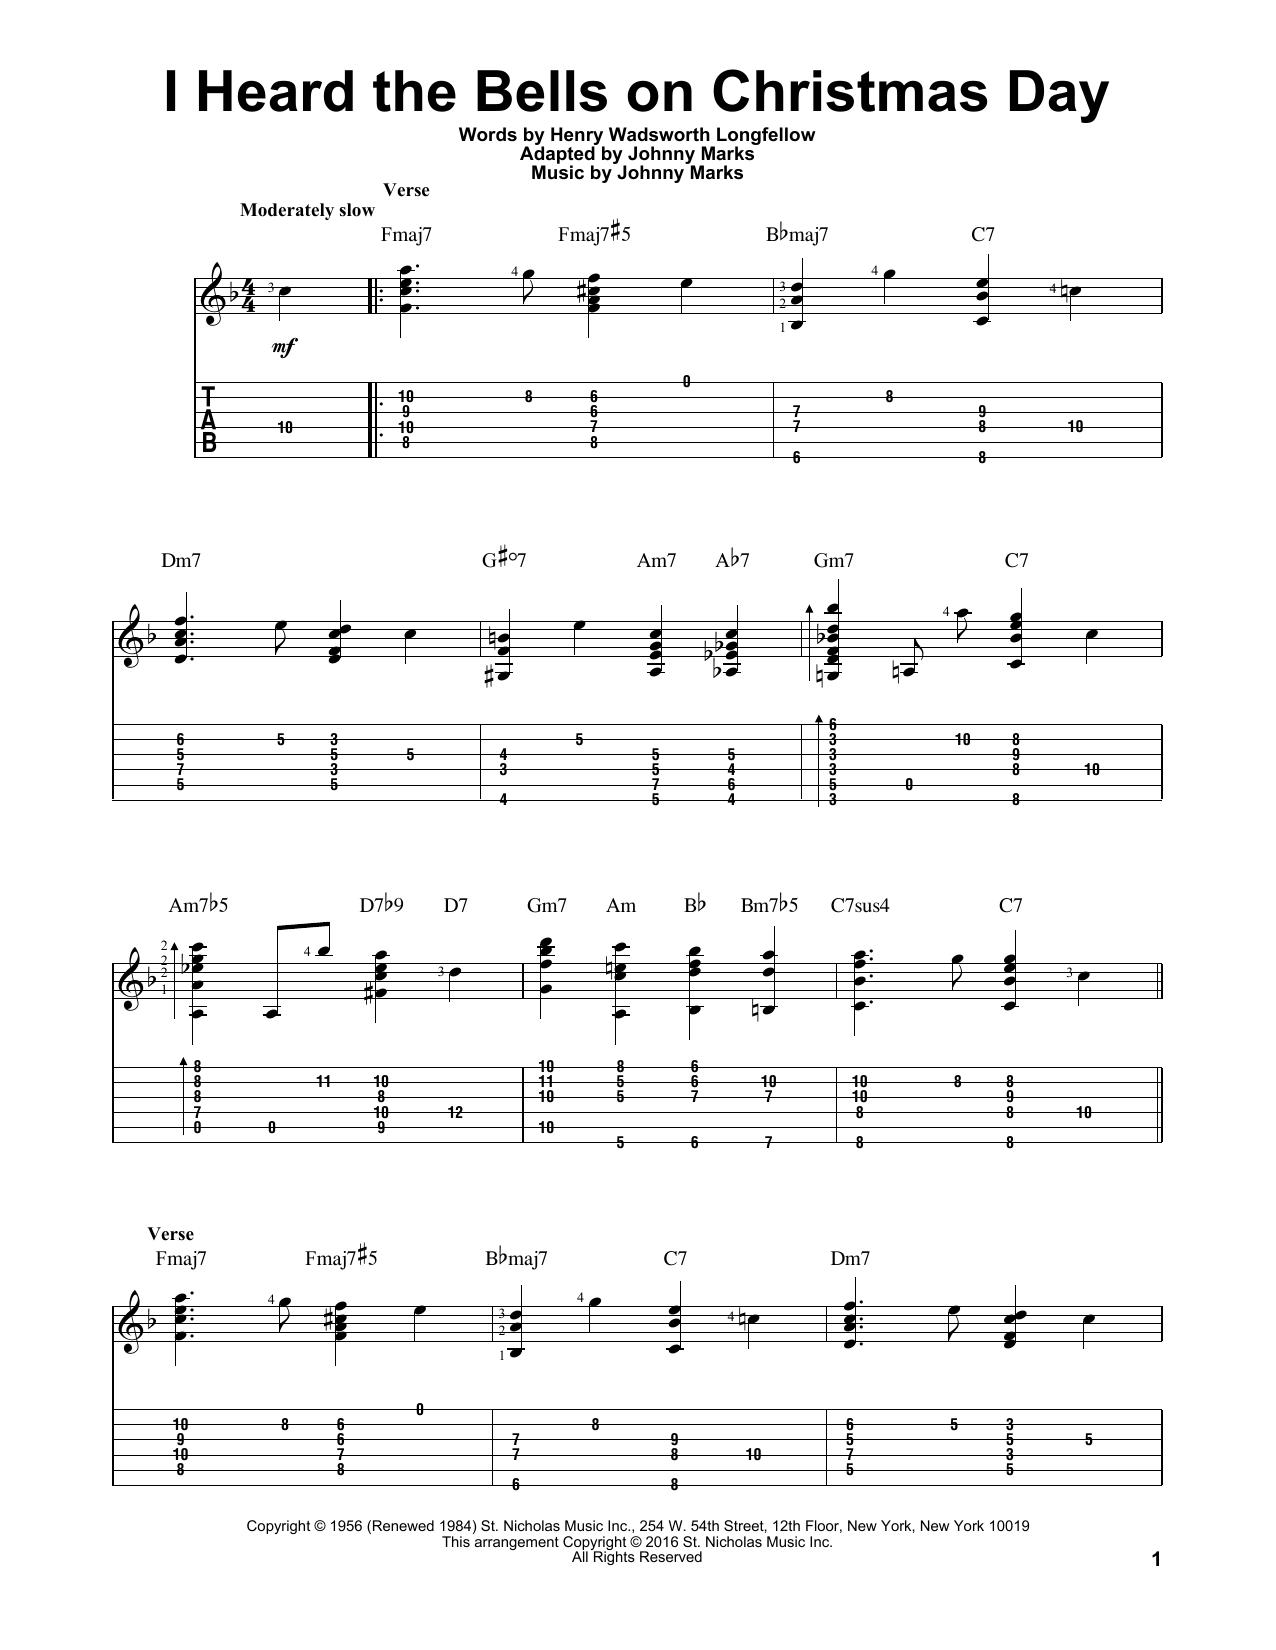 Johnny Marks - I Heard The Bells On Christmas Day